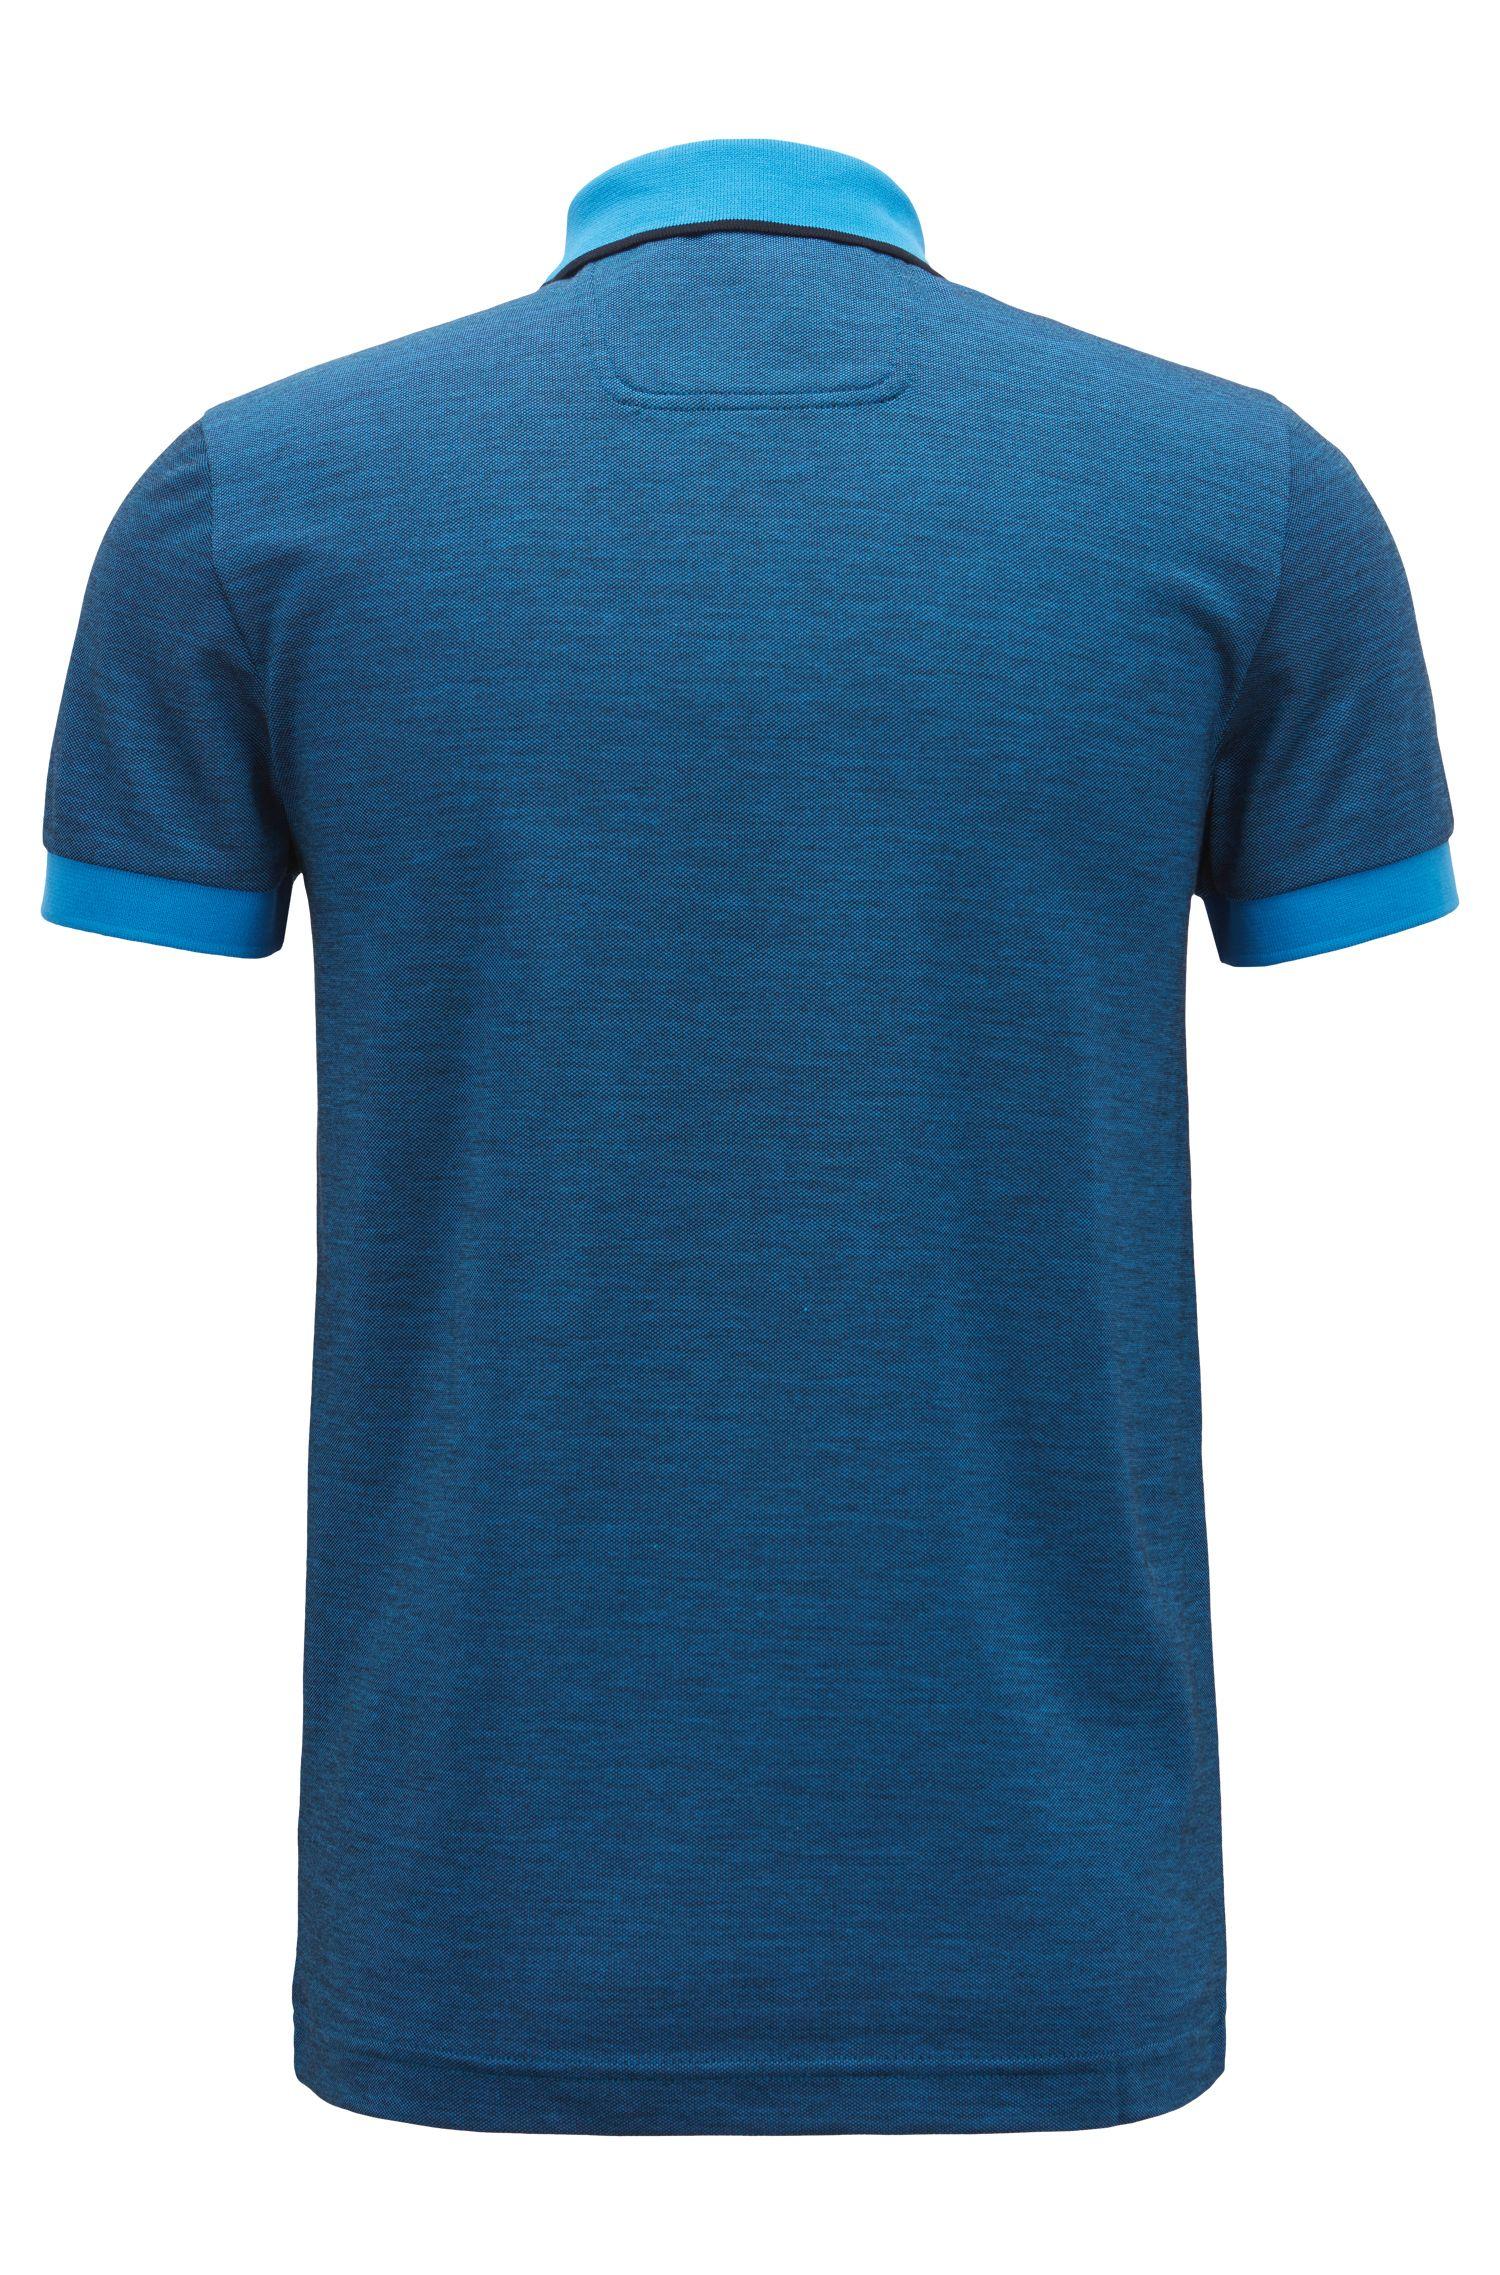 Slim-fit logo polo shirt in cotton piqué, Blue